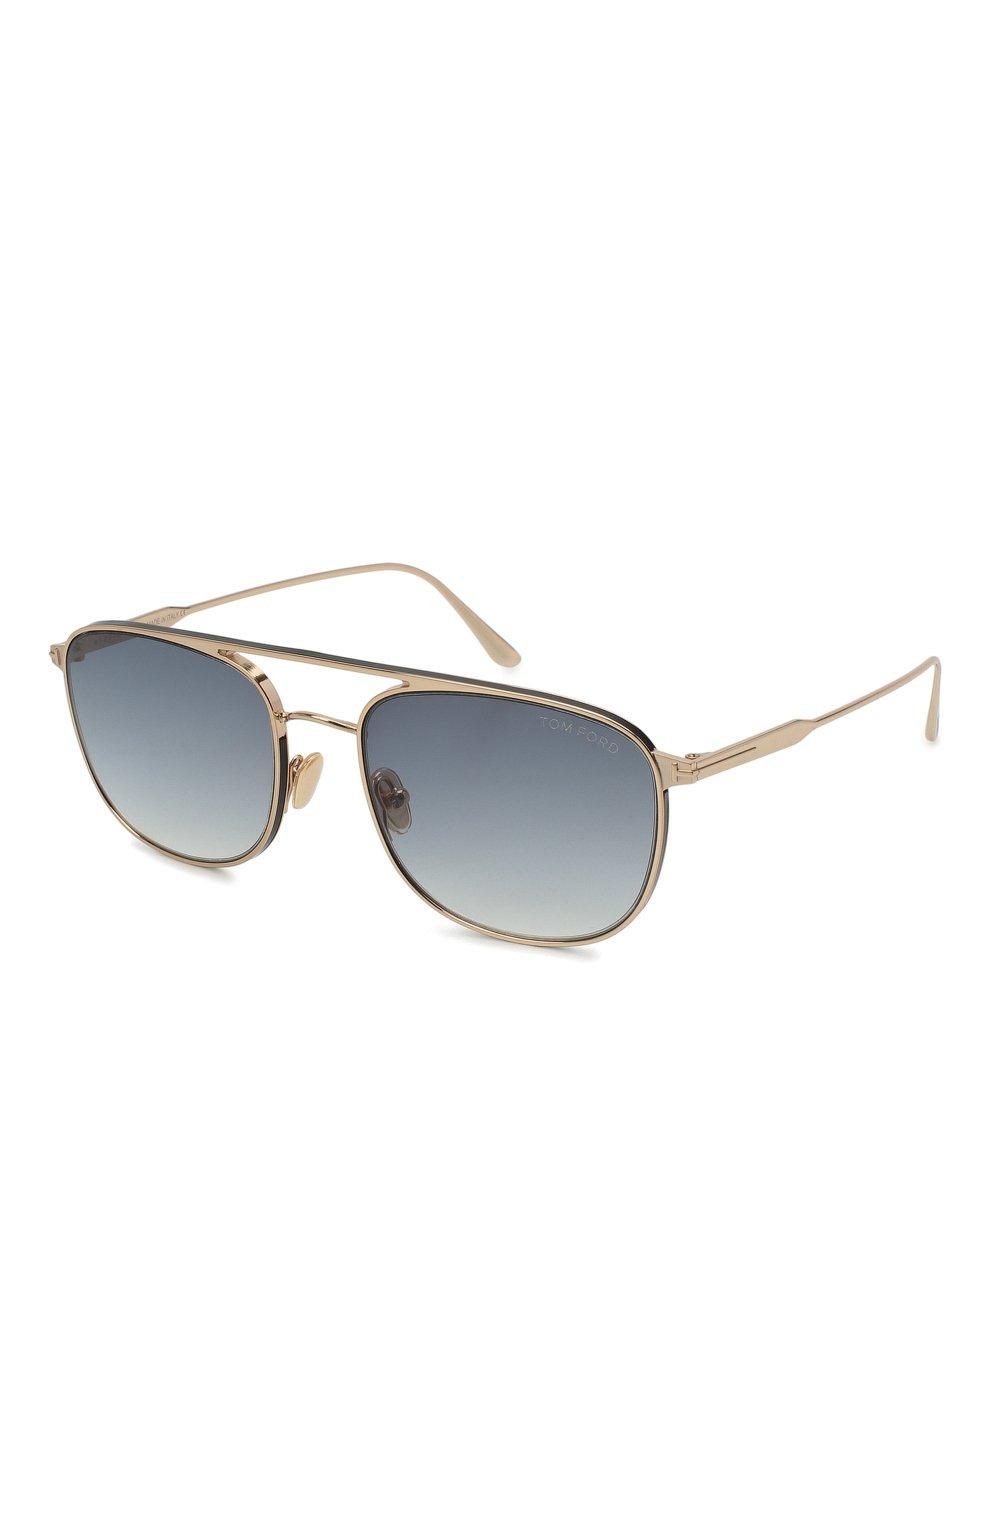 Мужские солнцезащитные очки TOM FORD золотого цвета, арт. TF827 28B | Фото 1